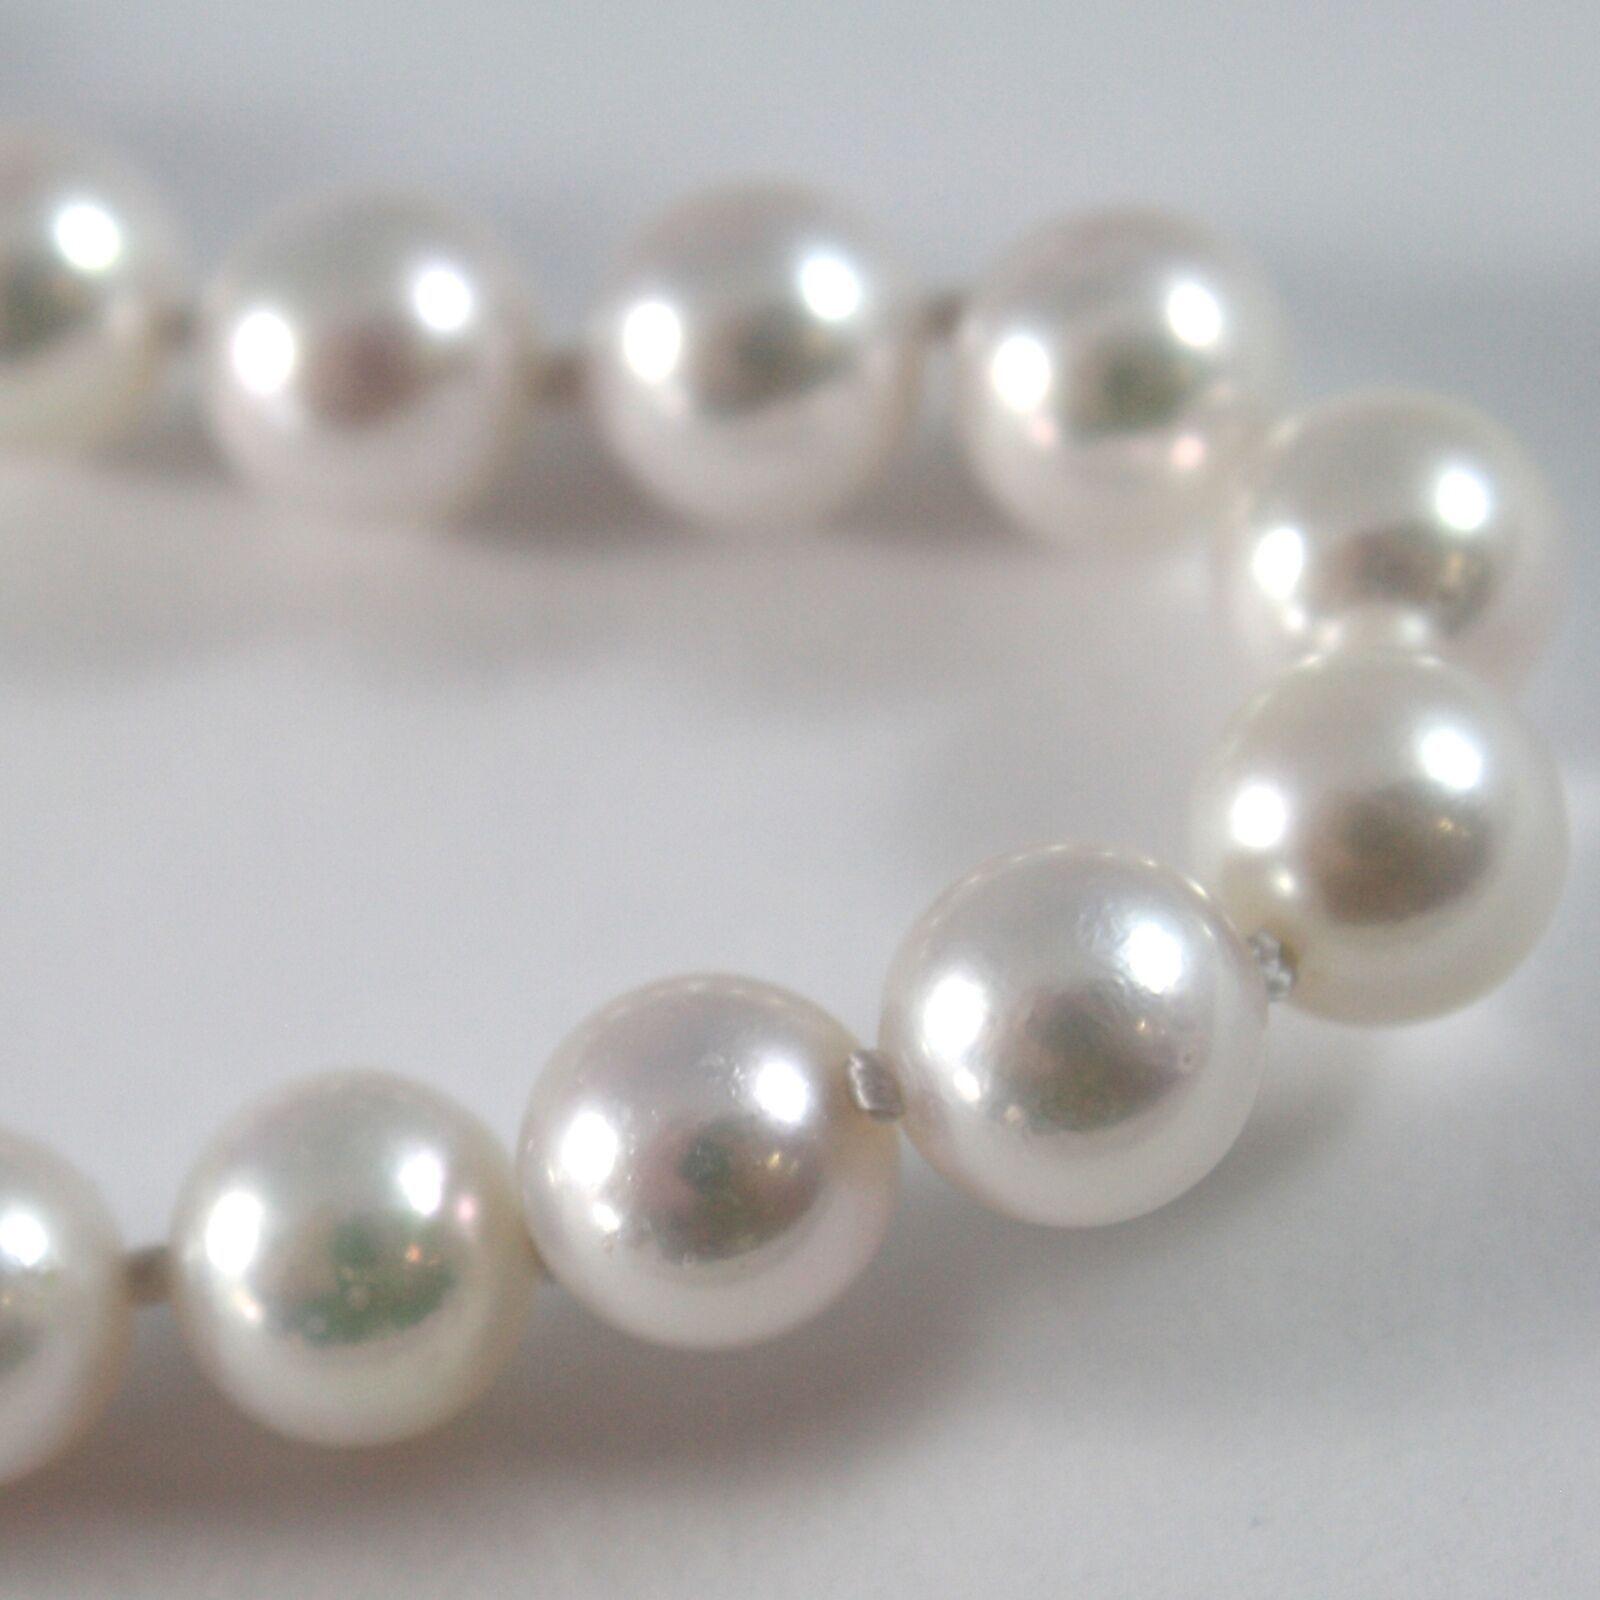 Armband Weißgold 750 18K, Strang Perlen Weiß Akoya Diam 8 mm, Lang 19 CM